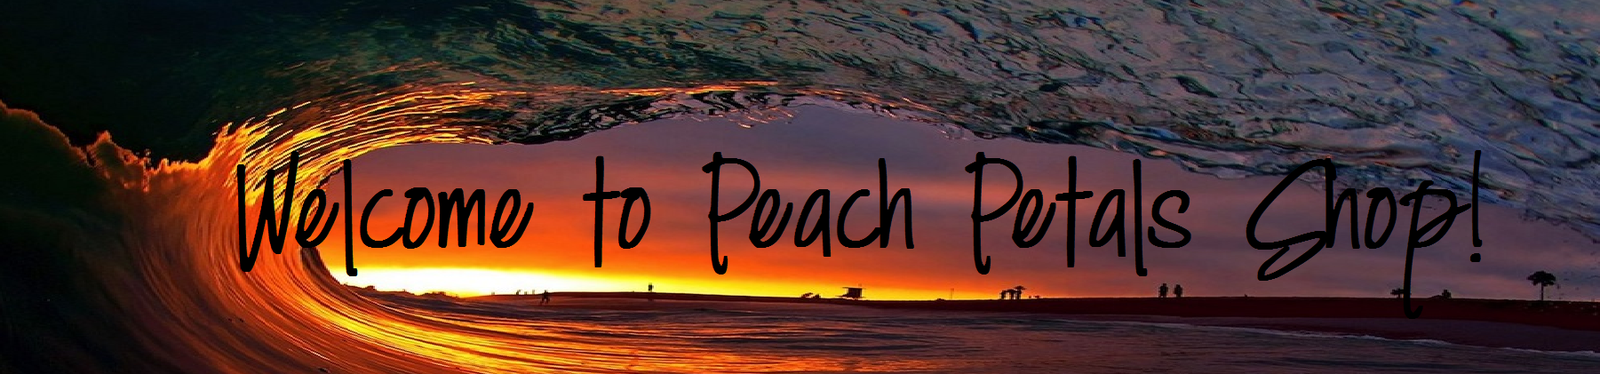 PeachPetalsShop